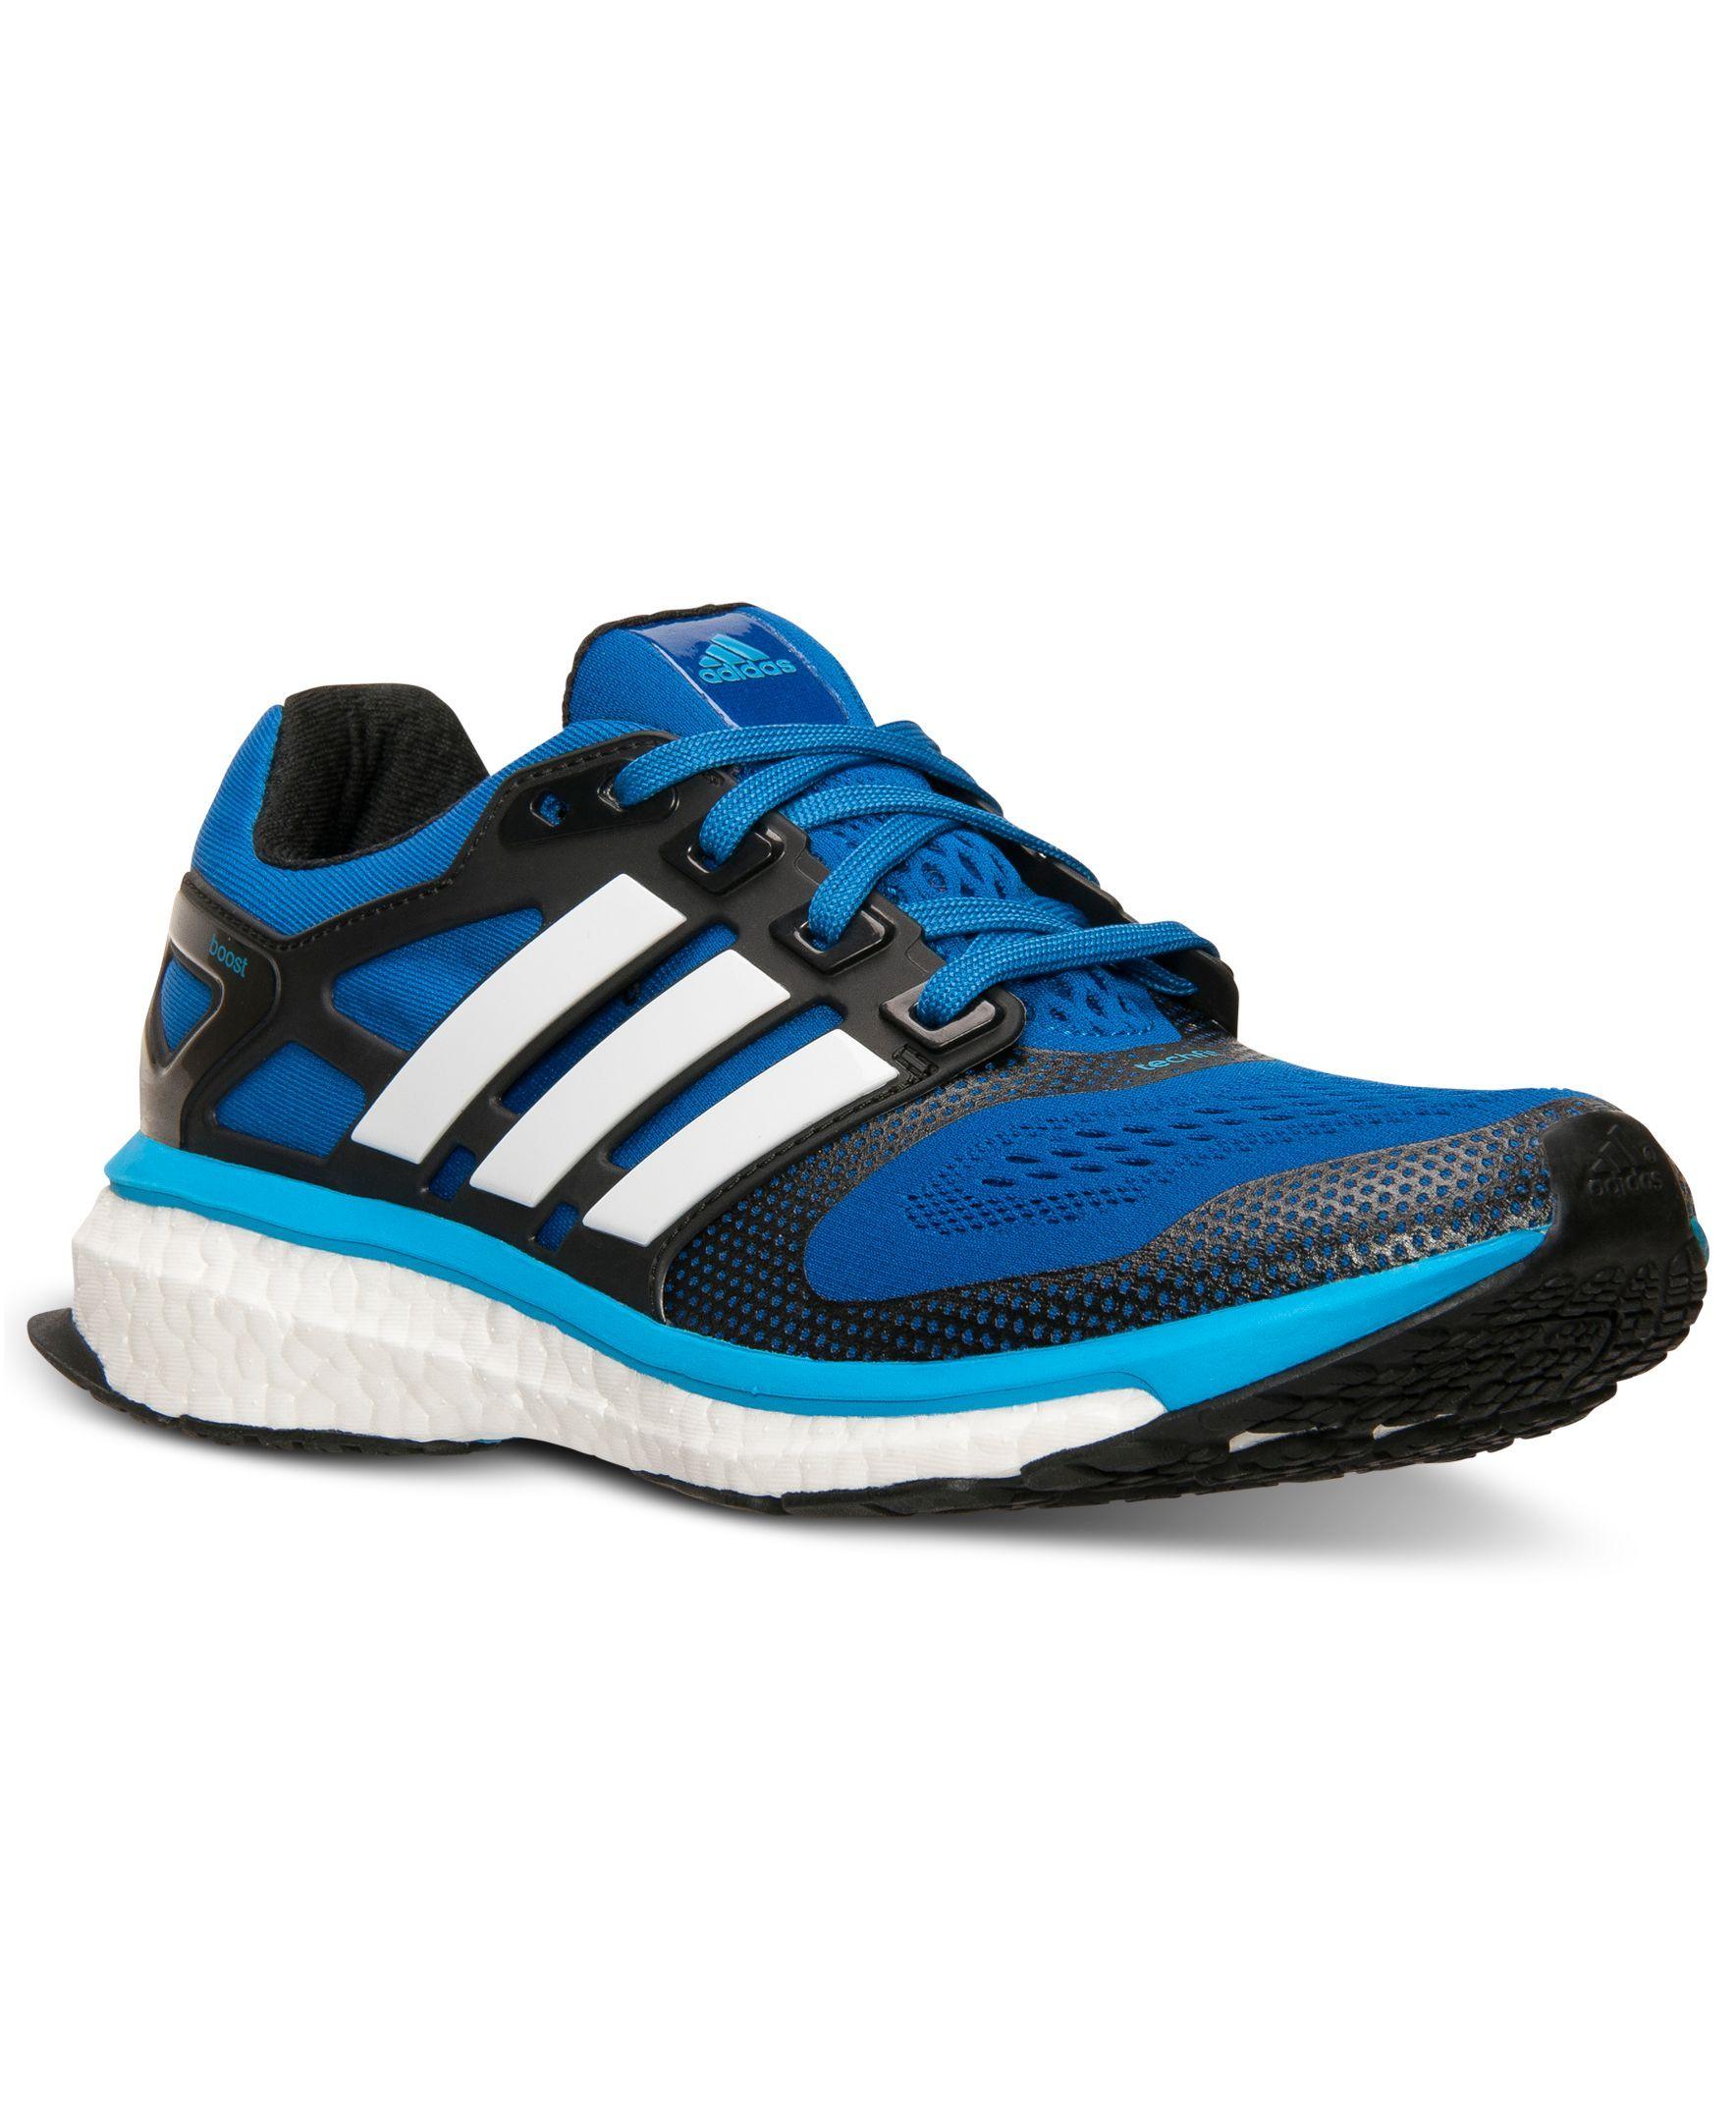 Chaussures de running Adidas Energy Boost 2.0 ESM Solar